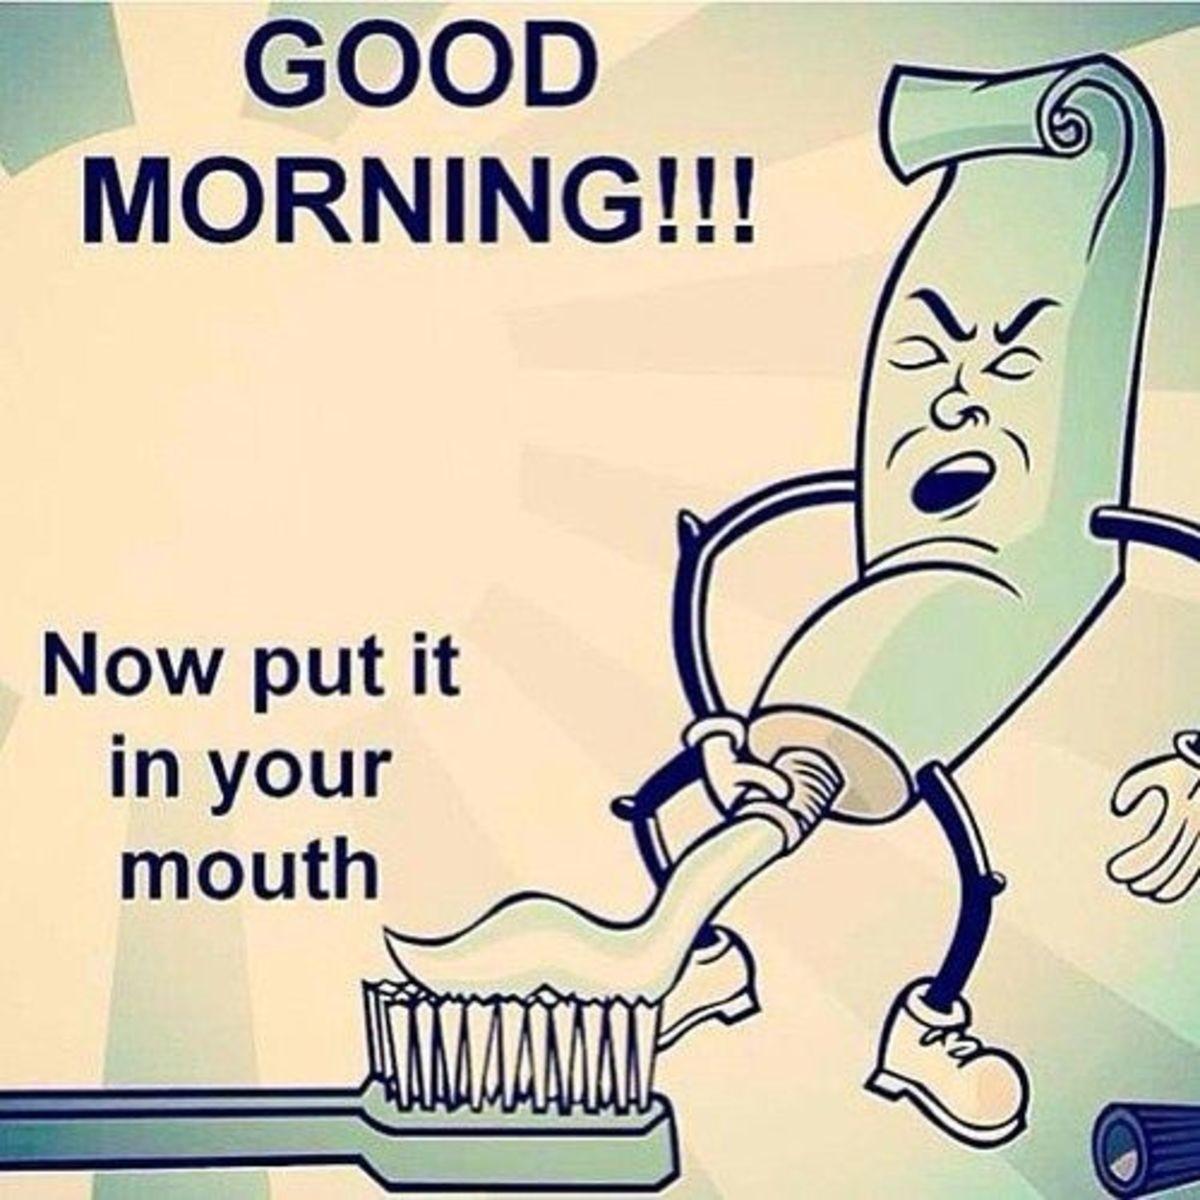 "Morning FunnyJunk. . Ill''"" GOOD MORNING!!! iis' 4 Now put it Morning FunnyJunk Ill''"" GOOD MORNING!!! iis' 4 Now put it"